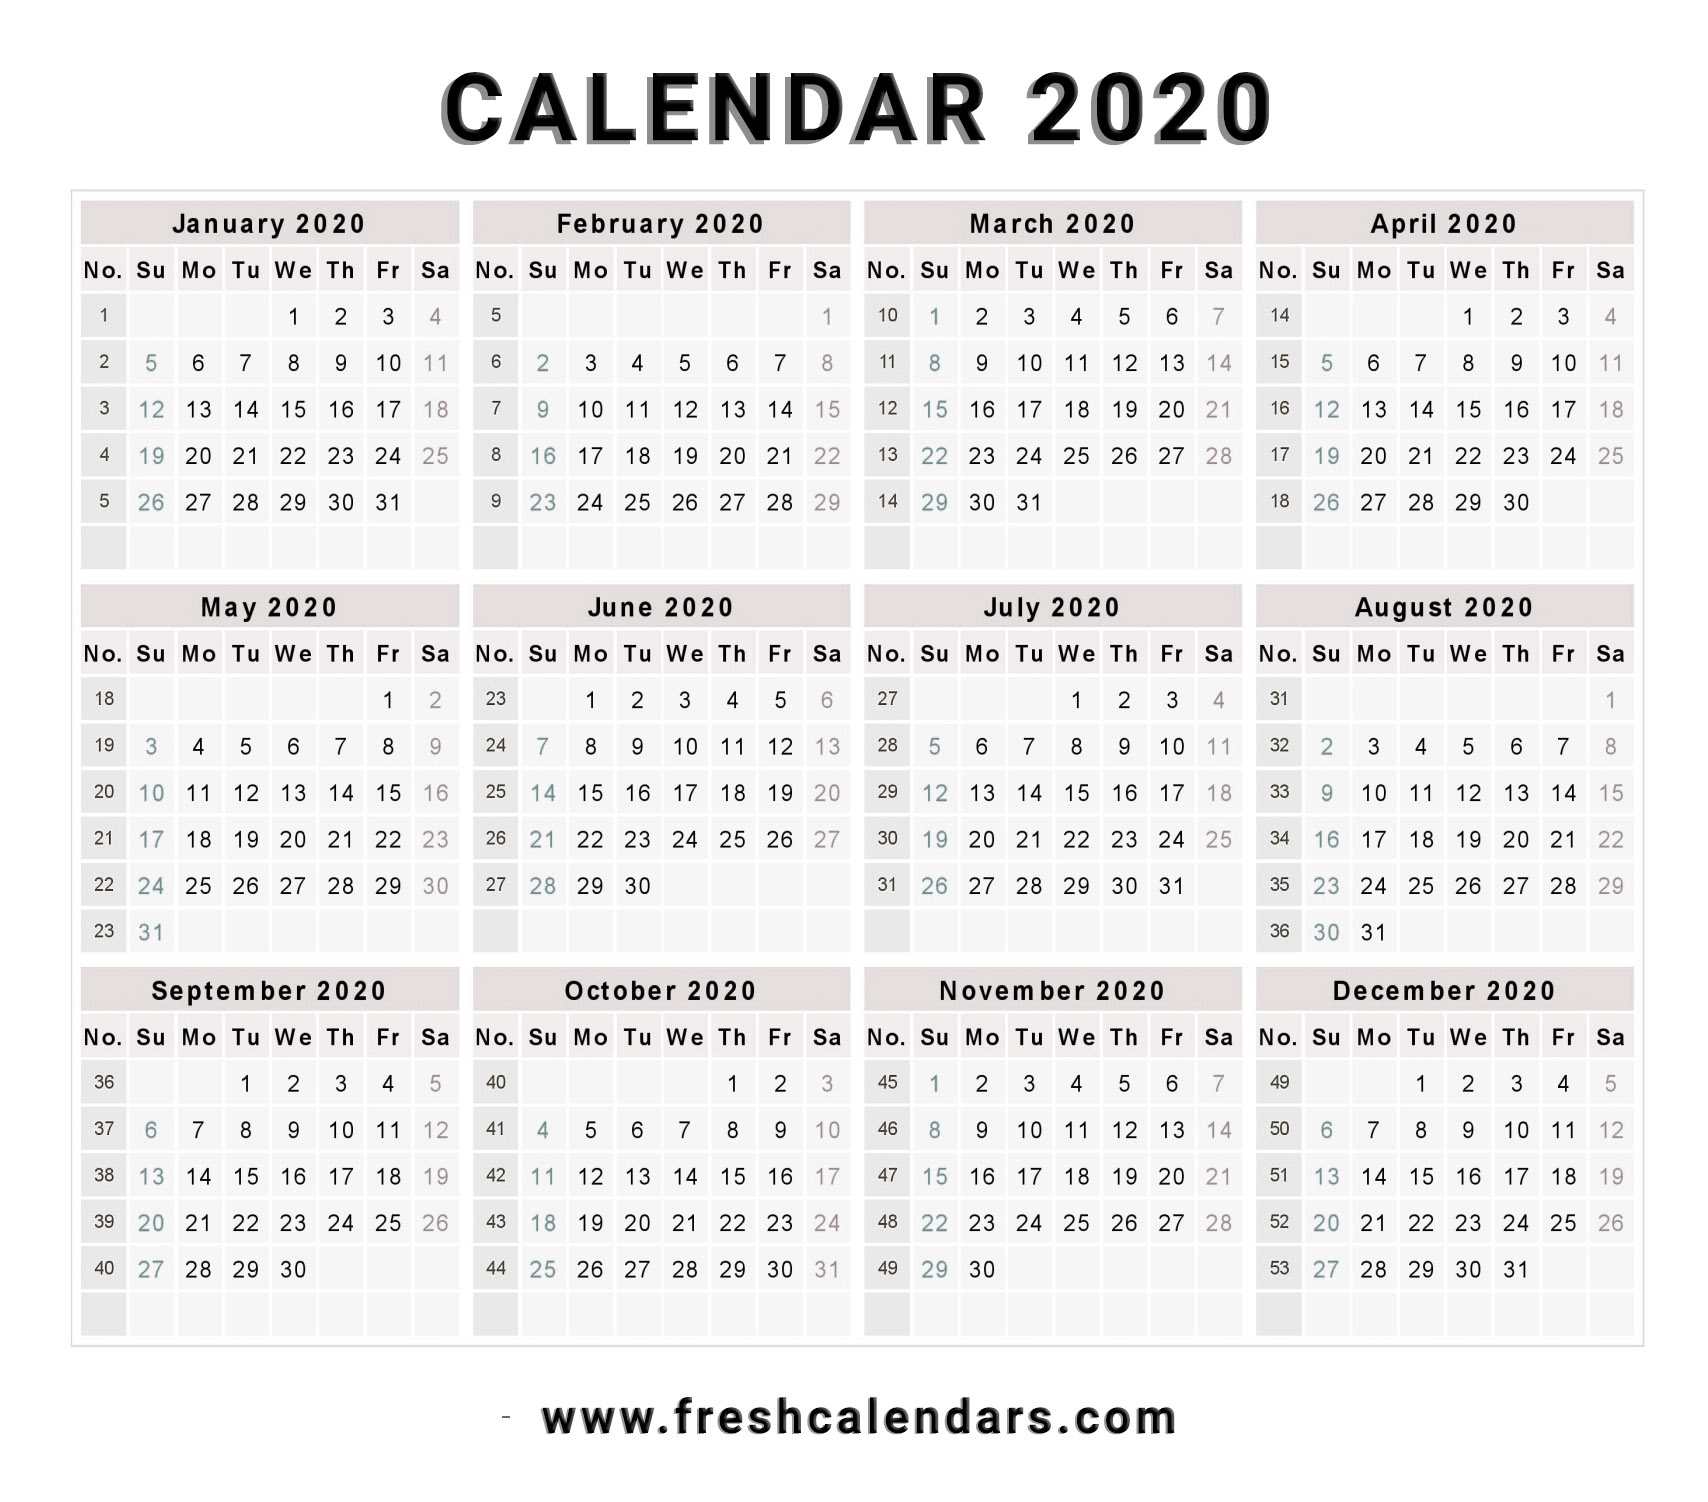 2020 Calendar in 2020 Calendar Printable Free Pdf